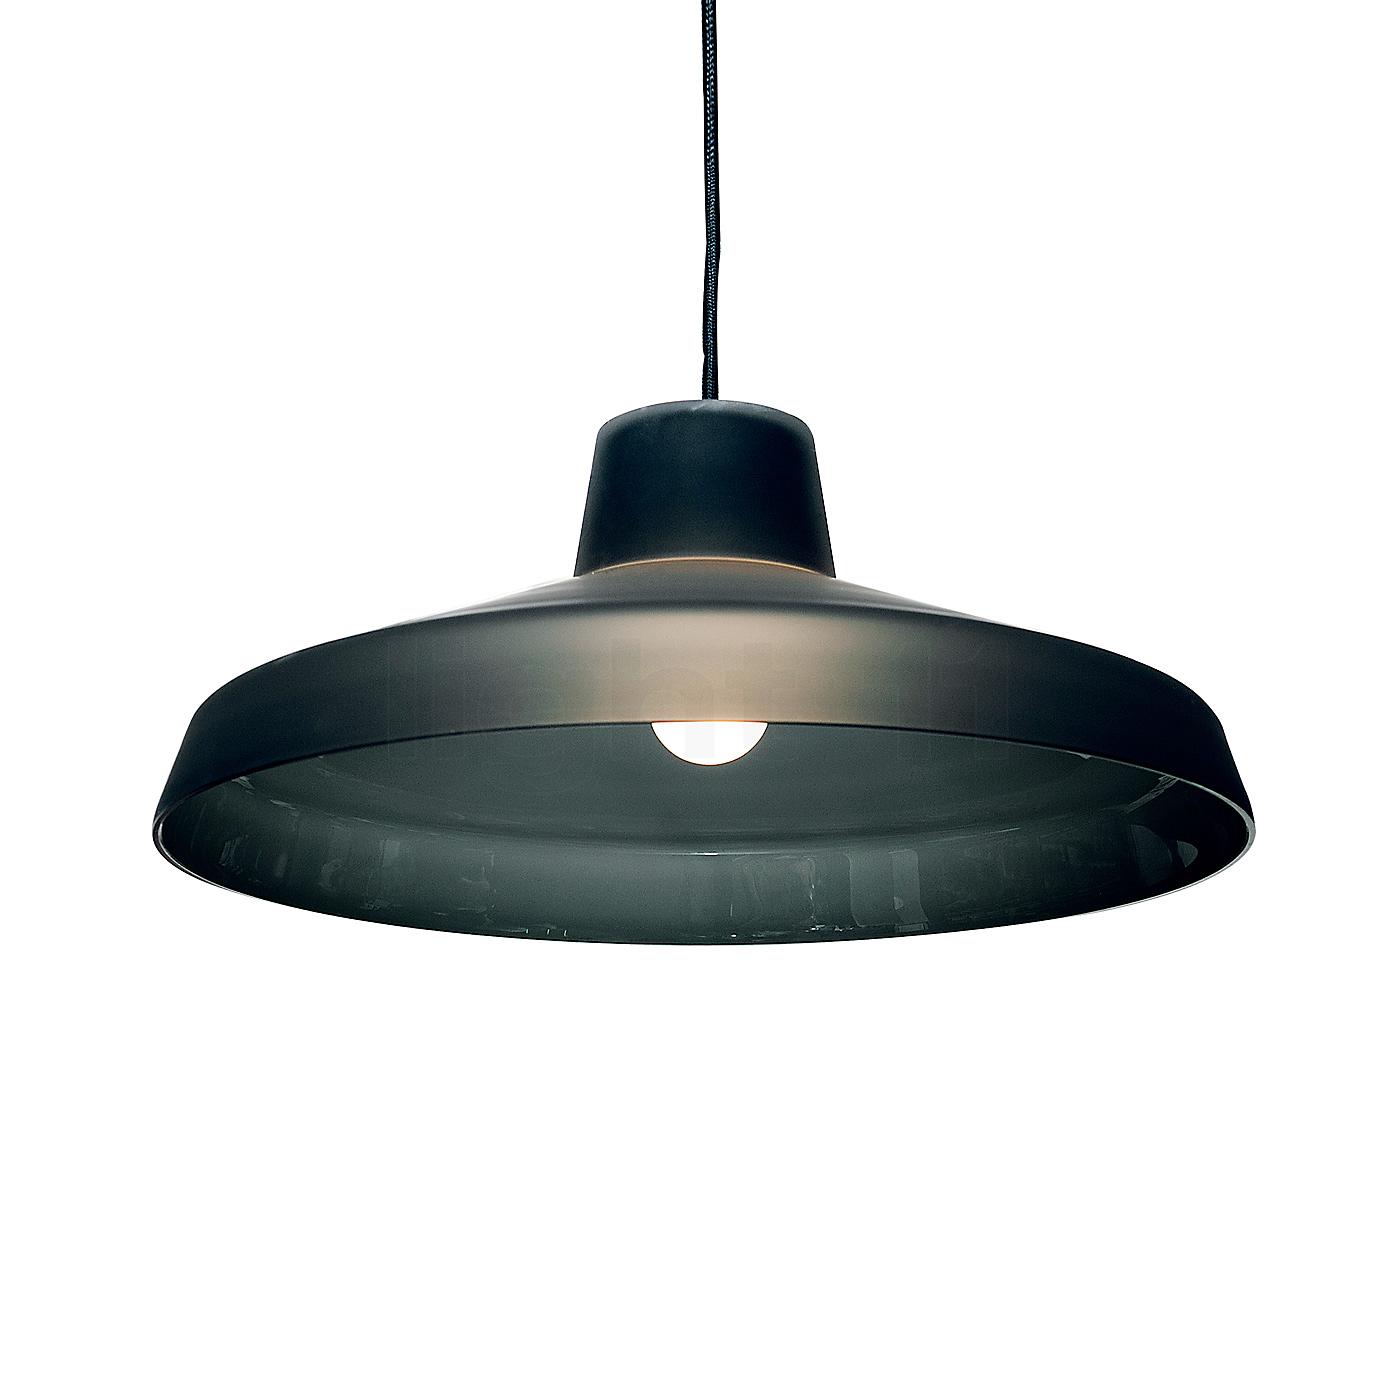 northern lighting evergreen pendelleuchte 40 cm pendelleuchte kaufen bei. Black Bedroom Furniture Sets. Home Design Ideas